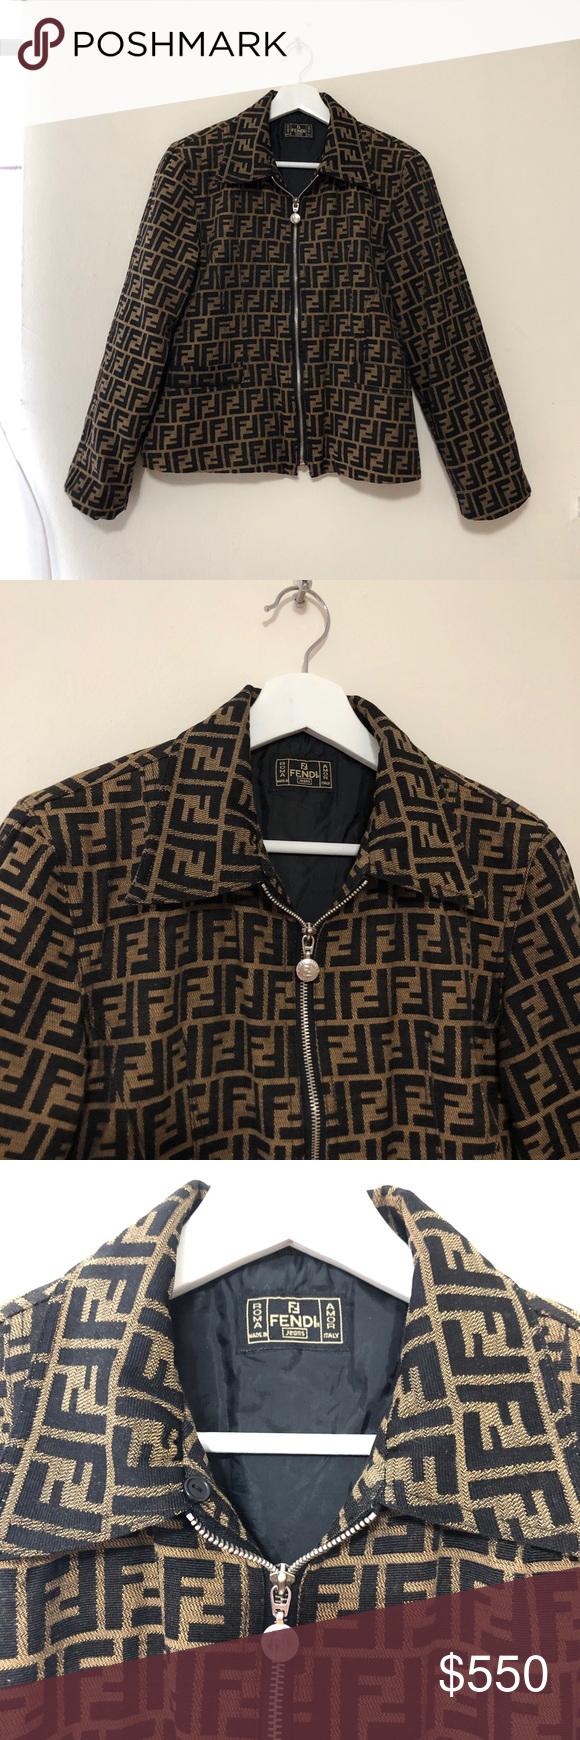 Vintage Fendi Zucca Monogram Jacket Monogram Jacket Clothes Design Jackets